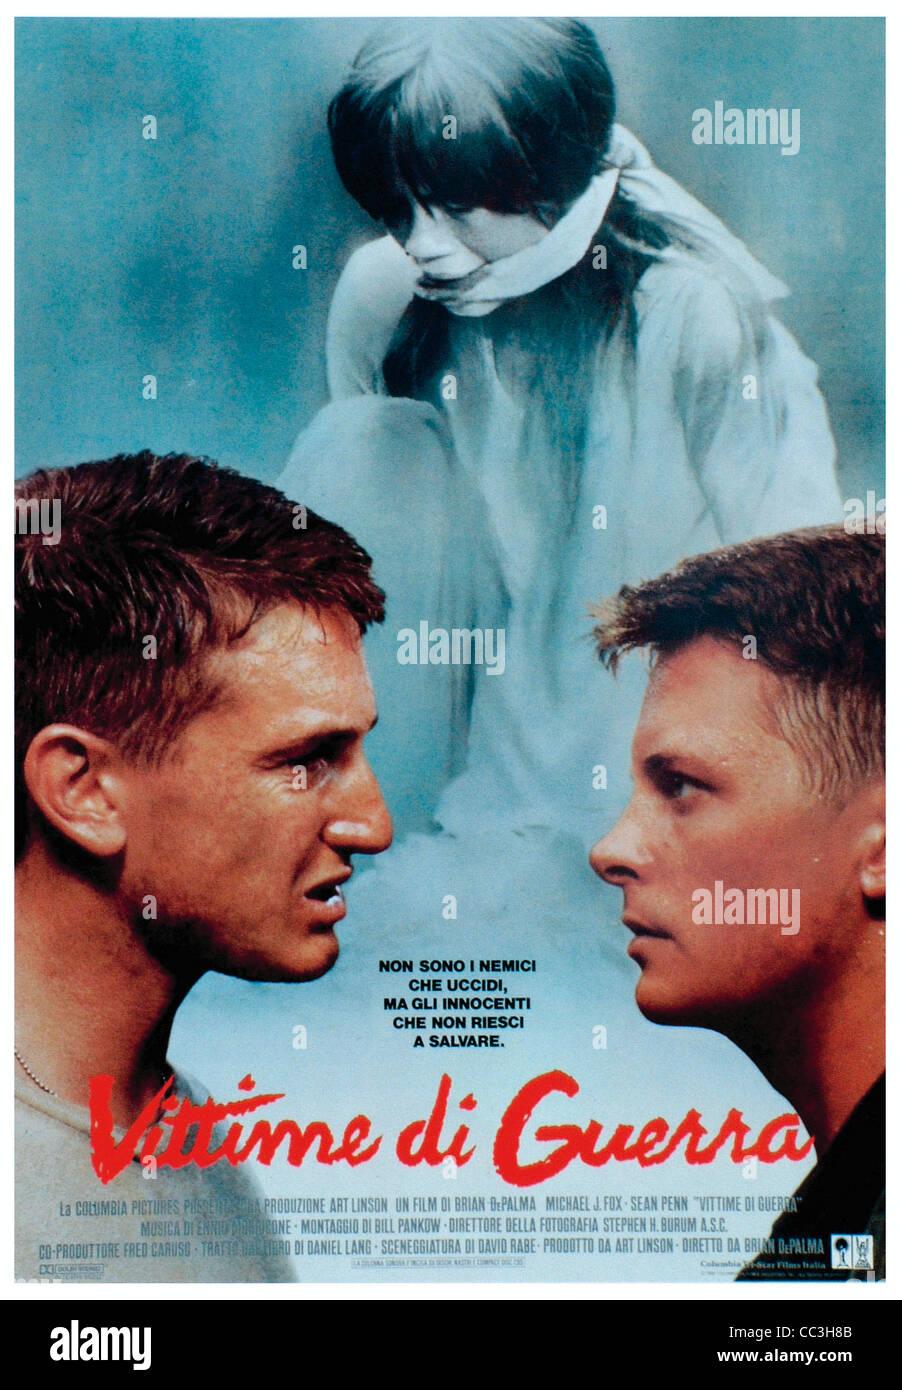 Cinema: The Victims Of War Director Brian De Palma 1989 Poster - Stock Image